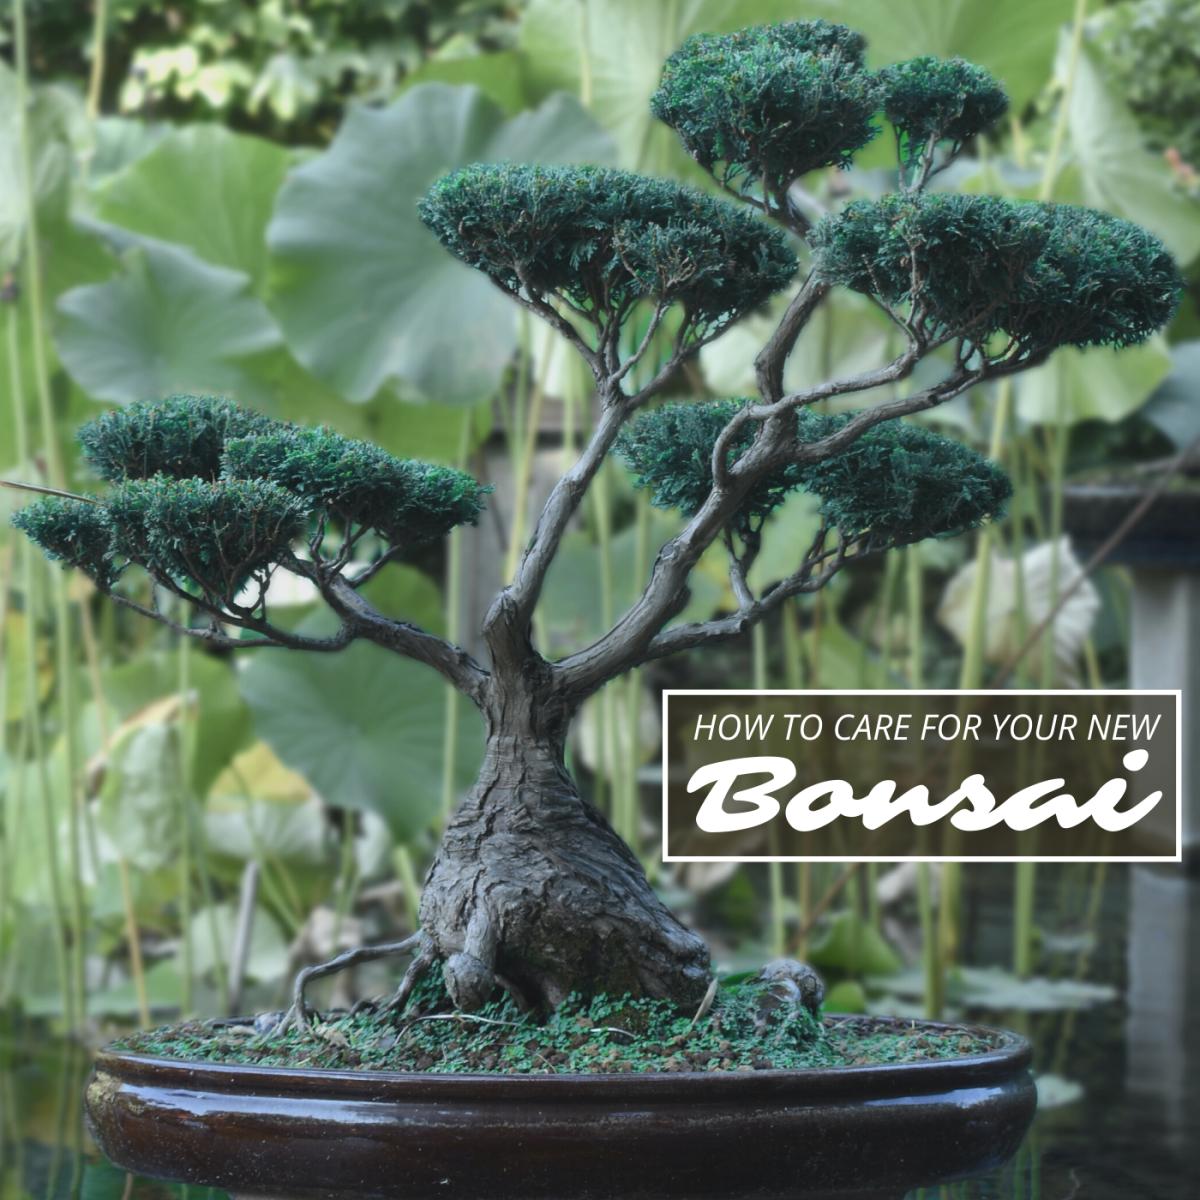 How to Take Care of a Bonsai Tree